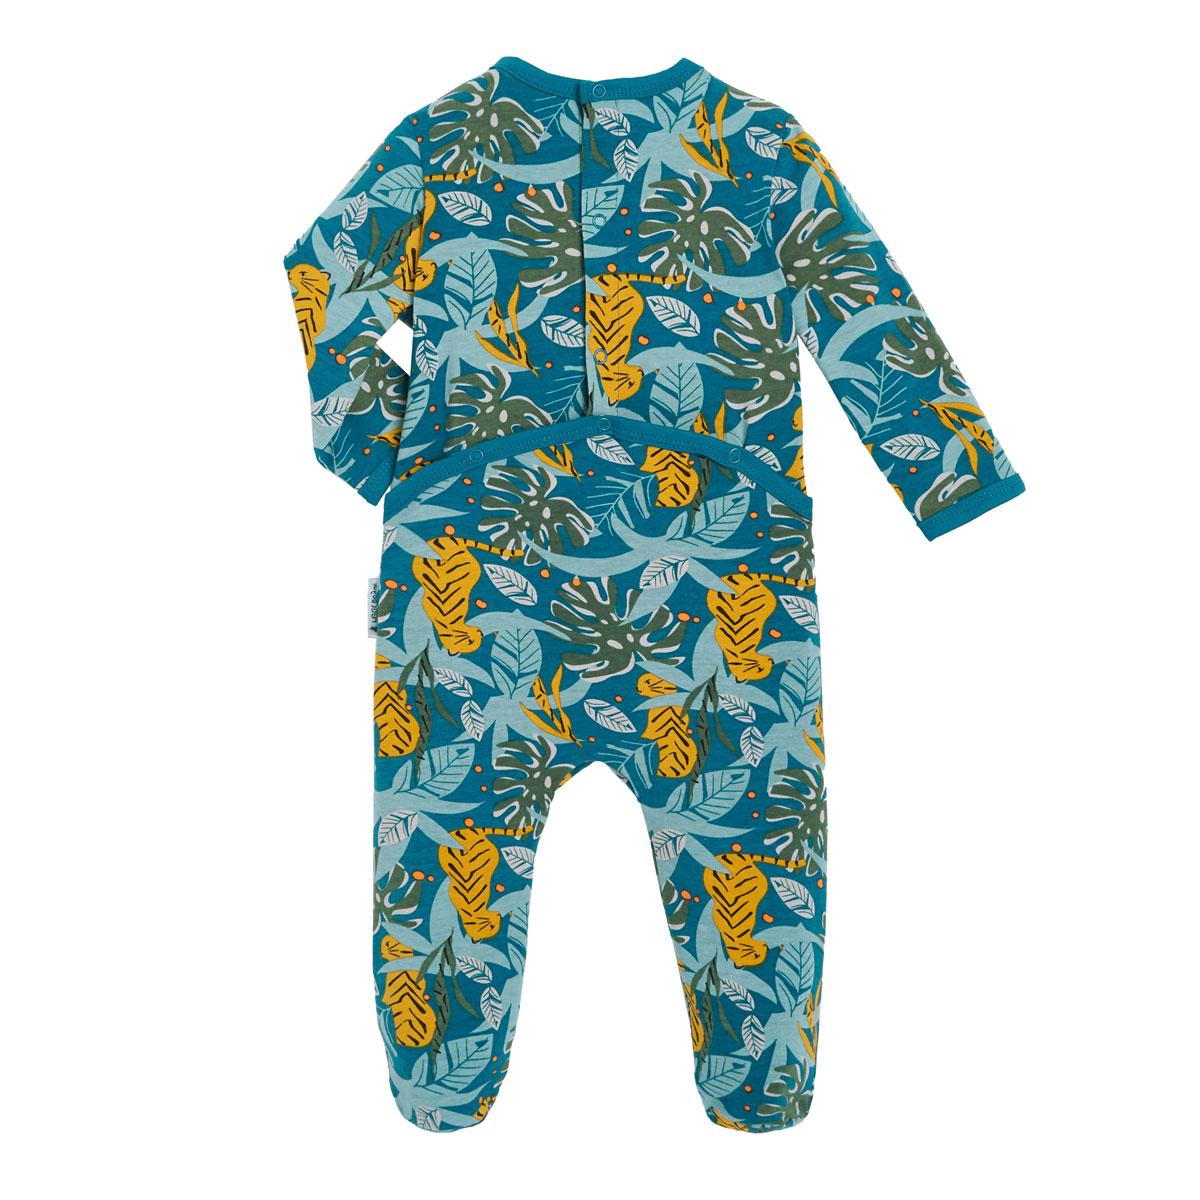 Pyjama bébé contenant du coton bio Malawi dos